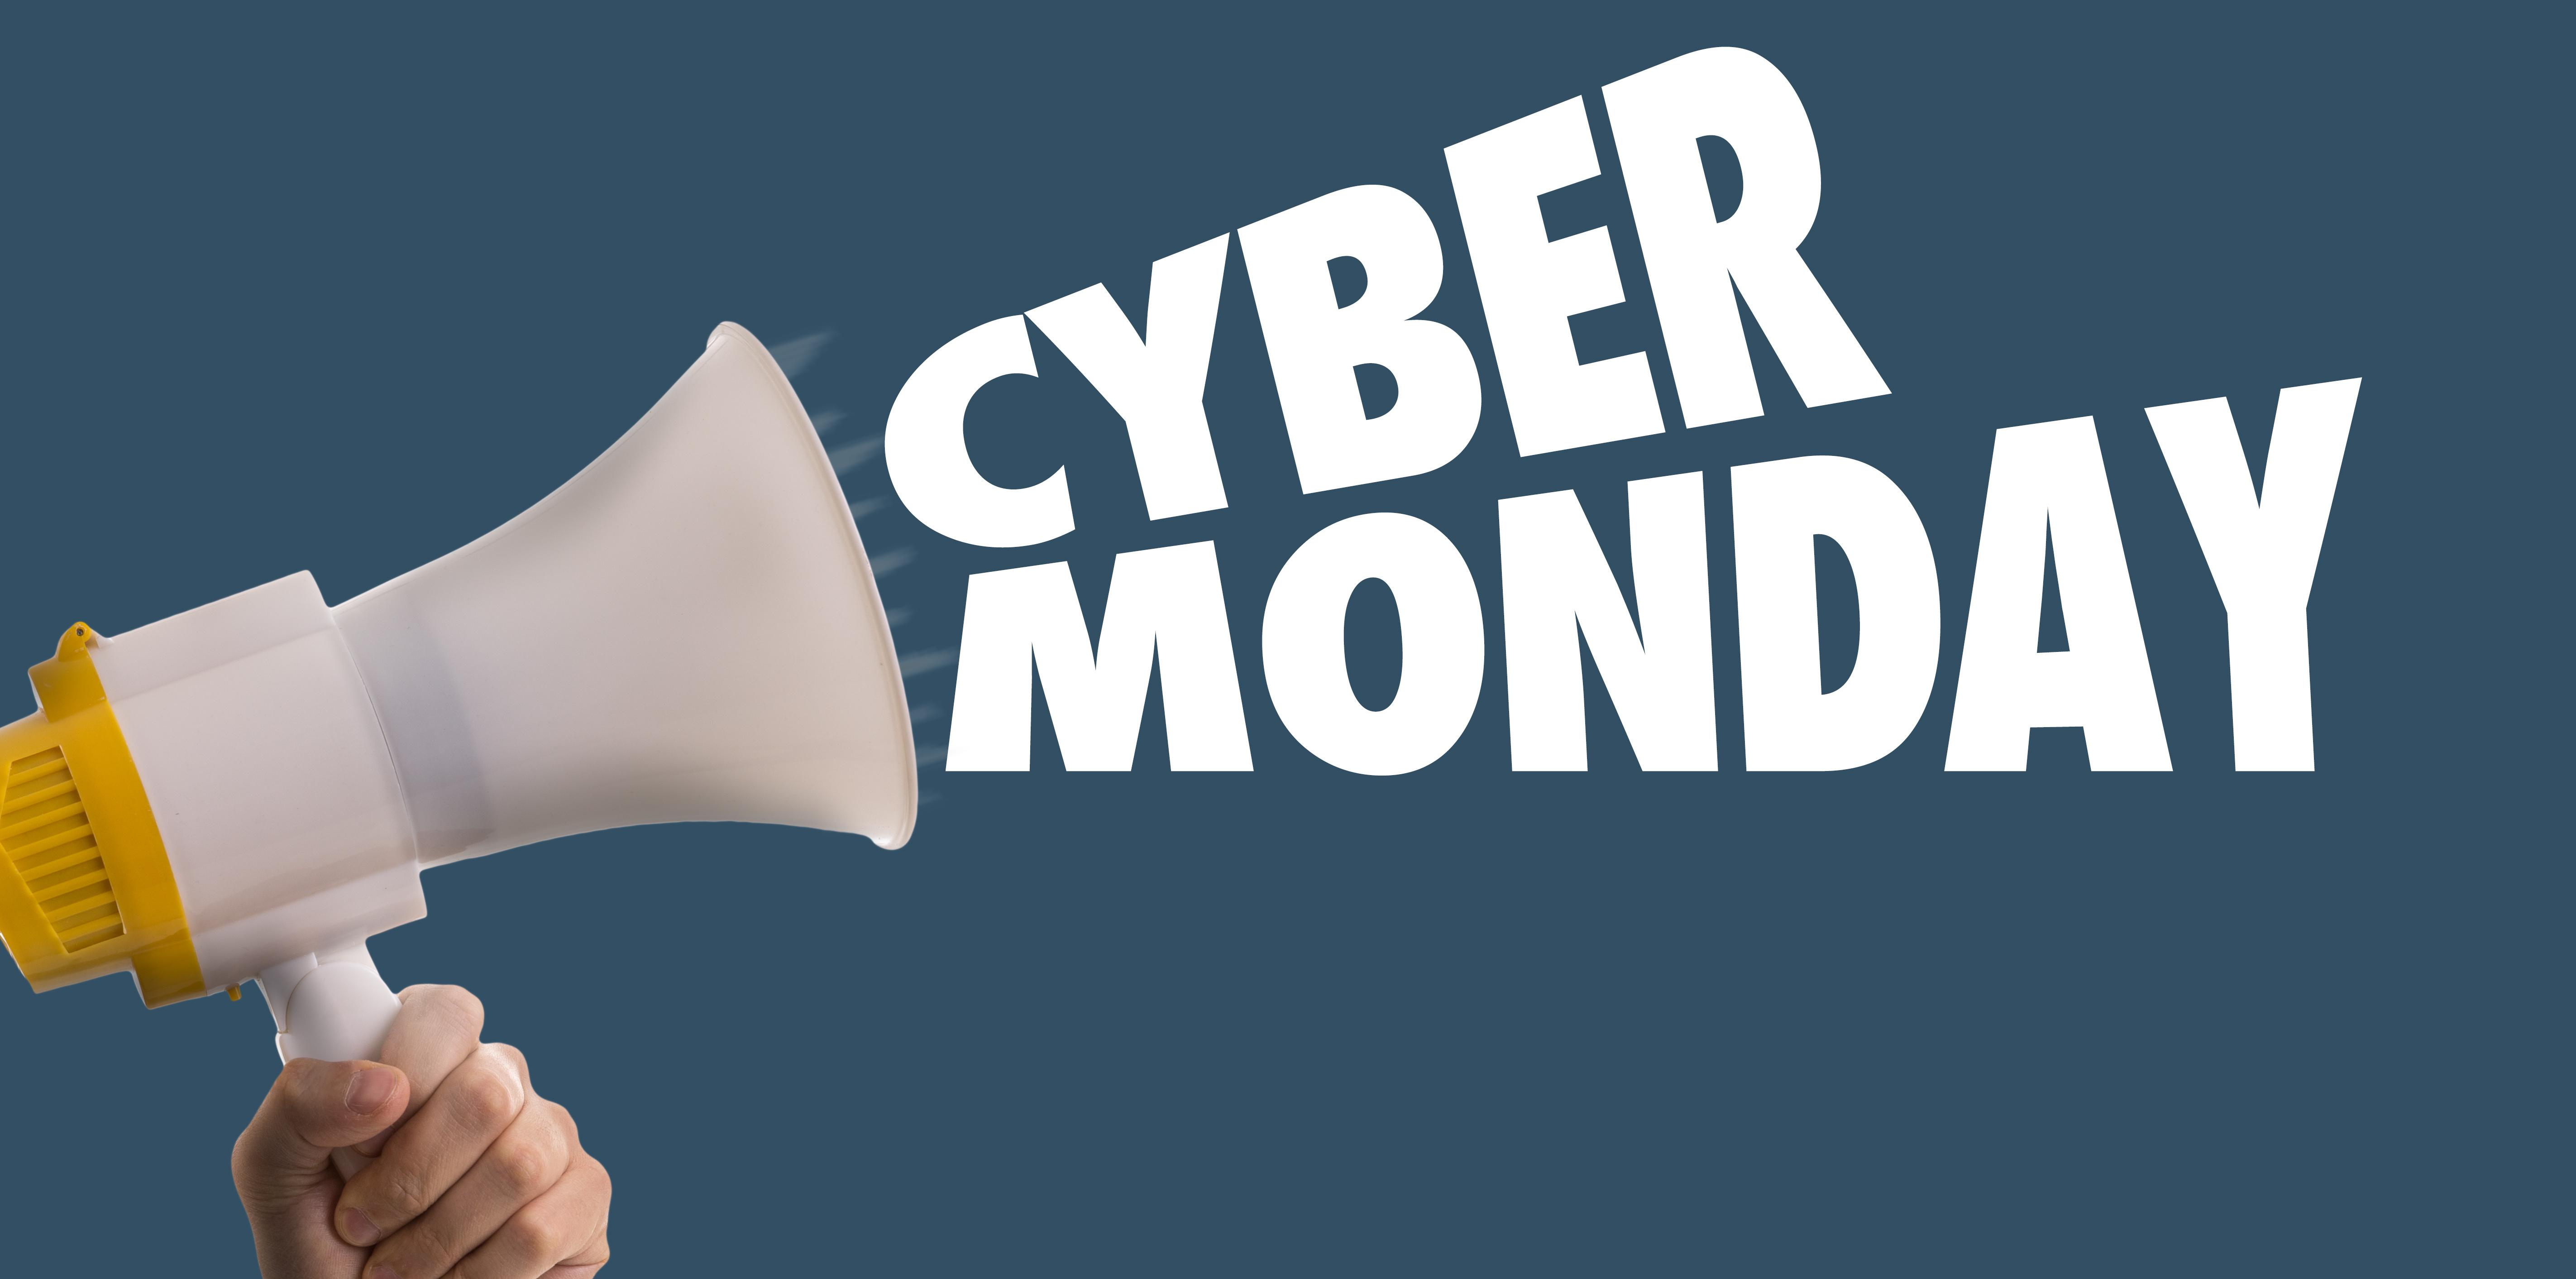 c95e3b489a0e Cyber Monday 2019: Las mejores ofertas - TopComparativas